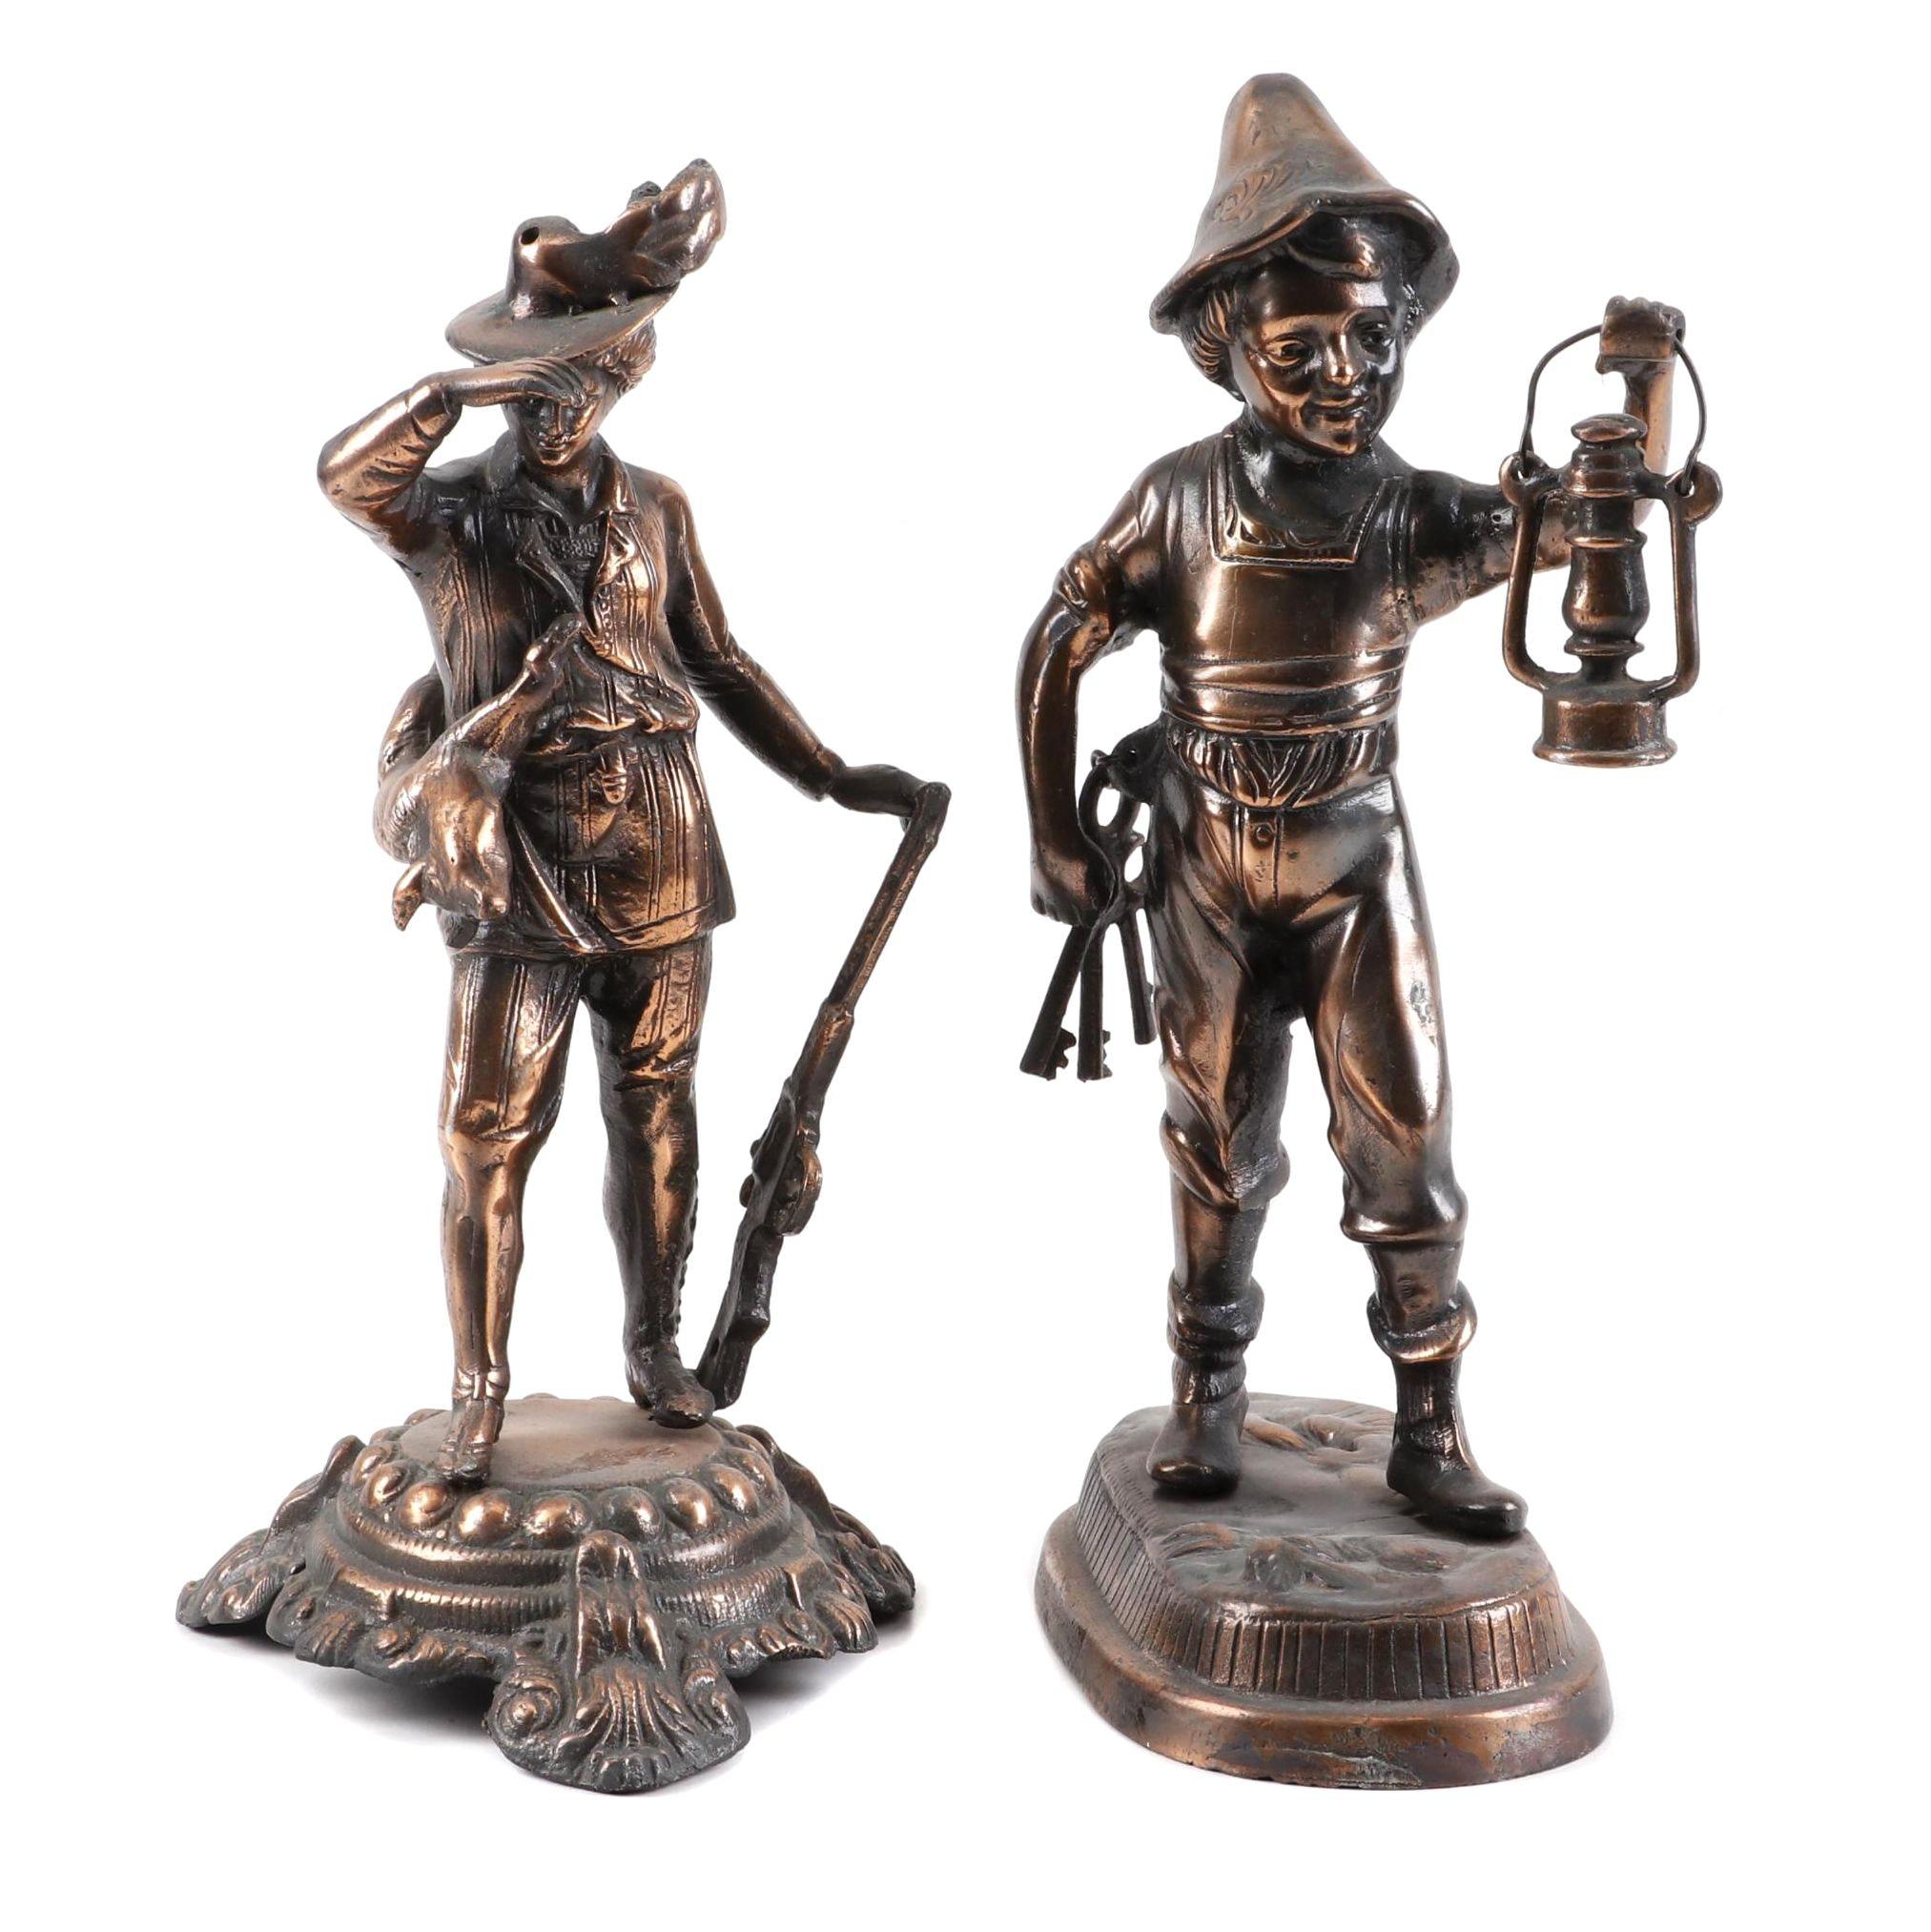 Cast Metal Copper Finish Figurines, Mid 20th Century